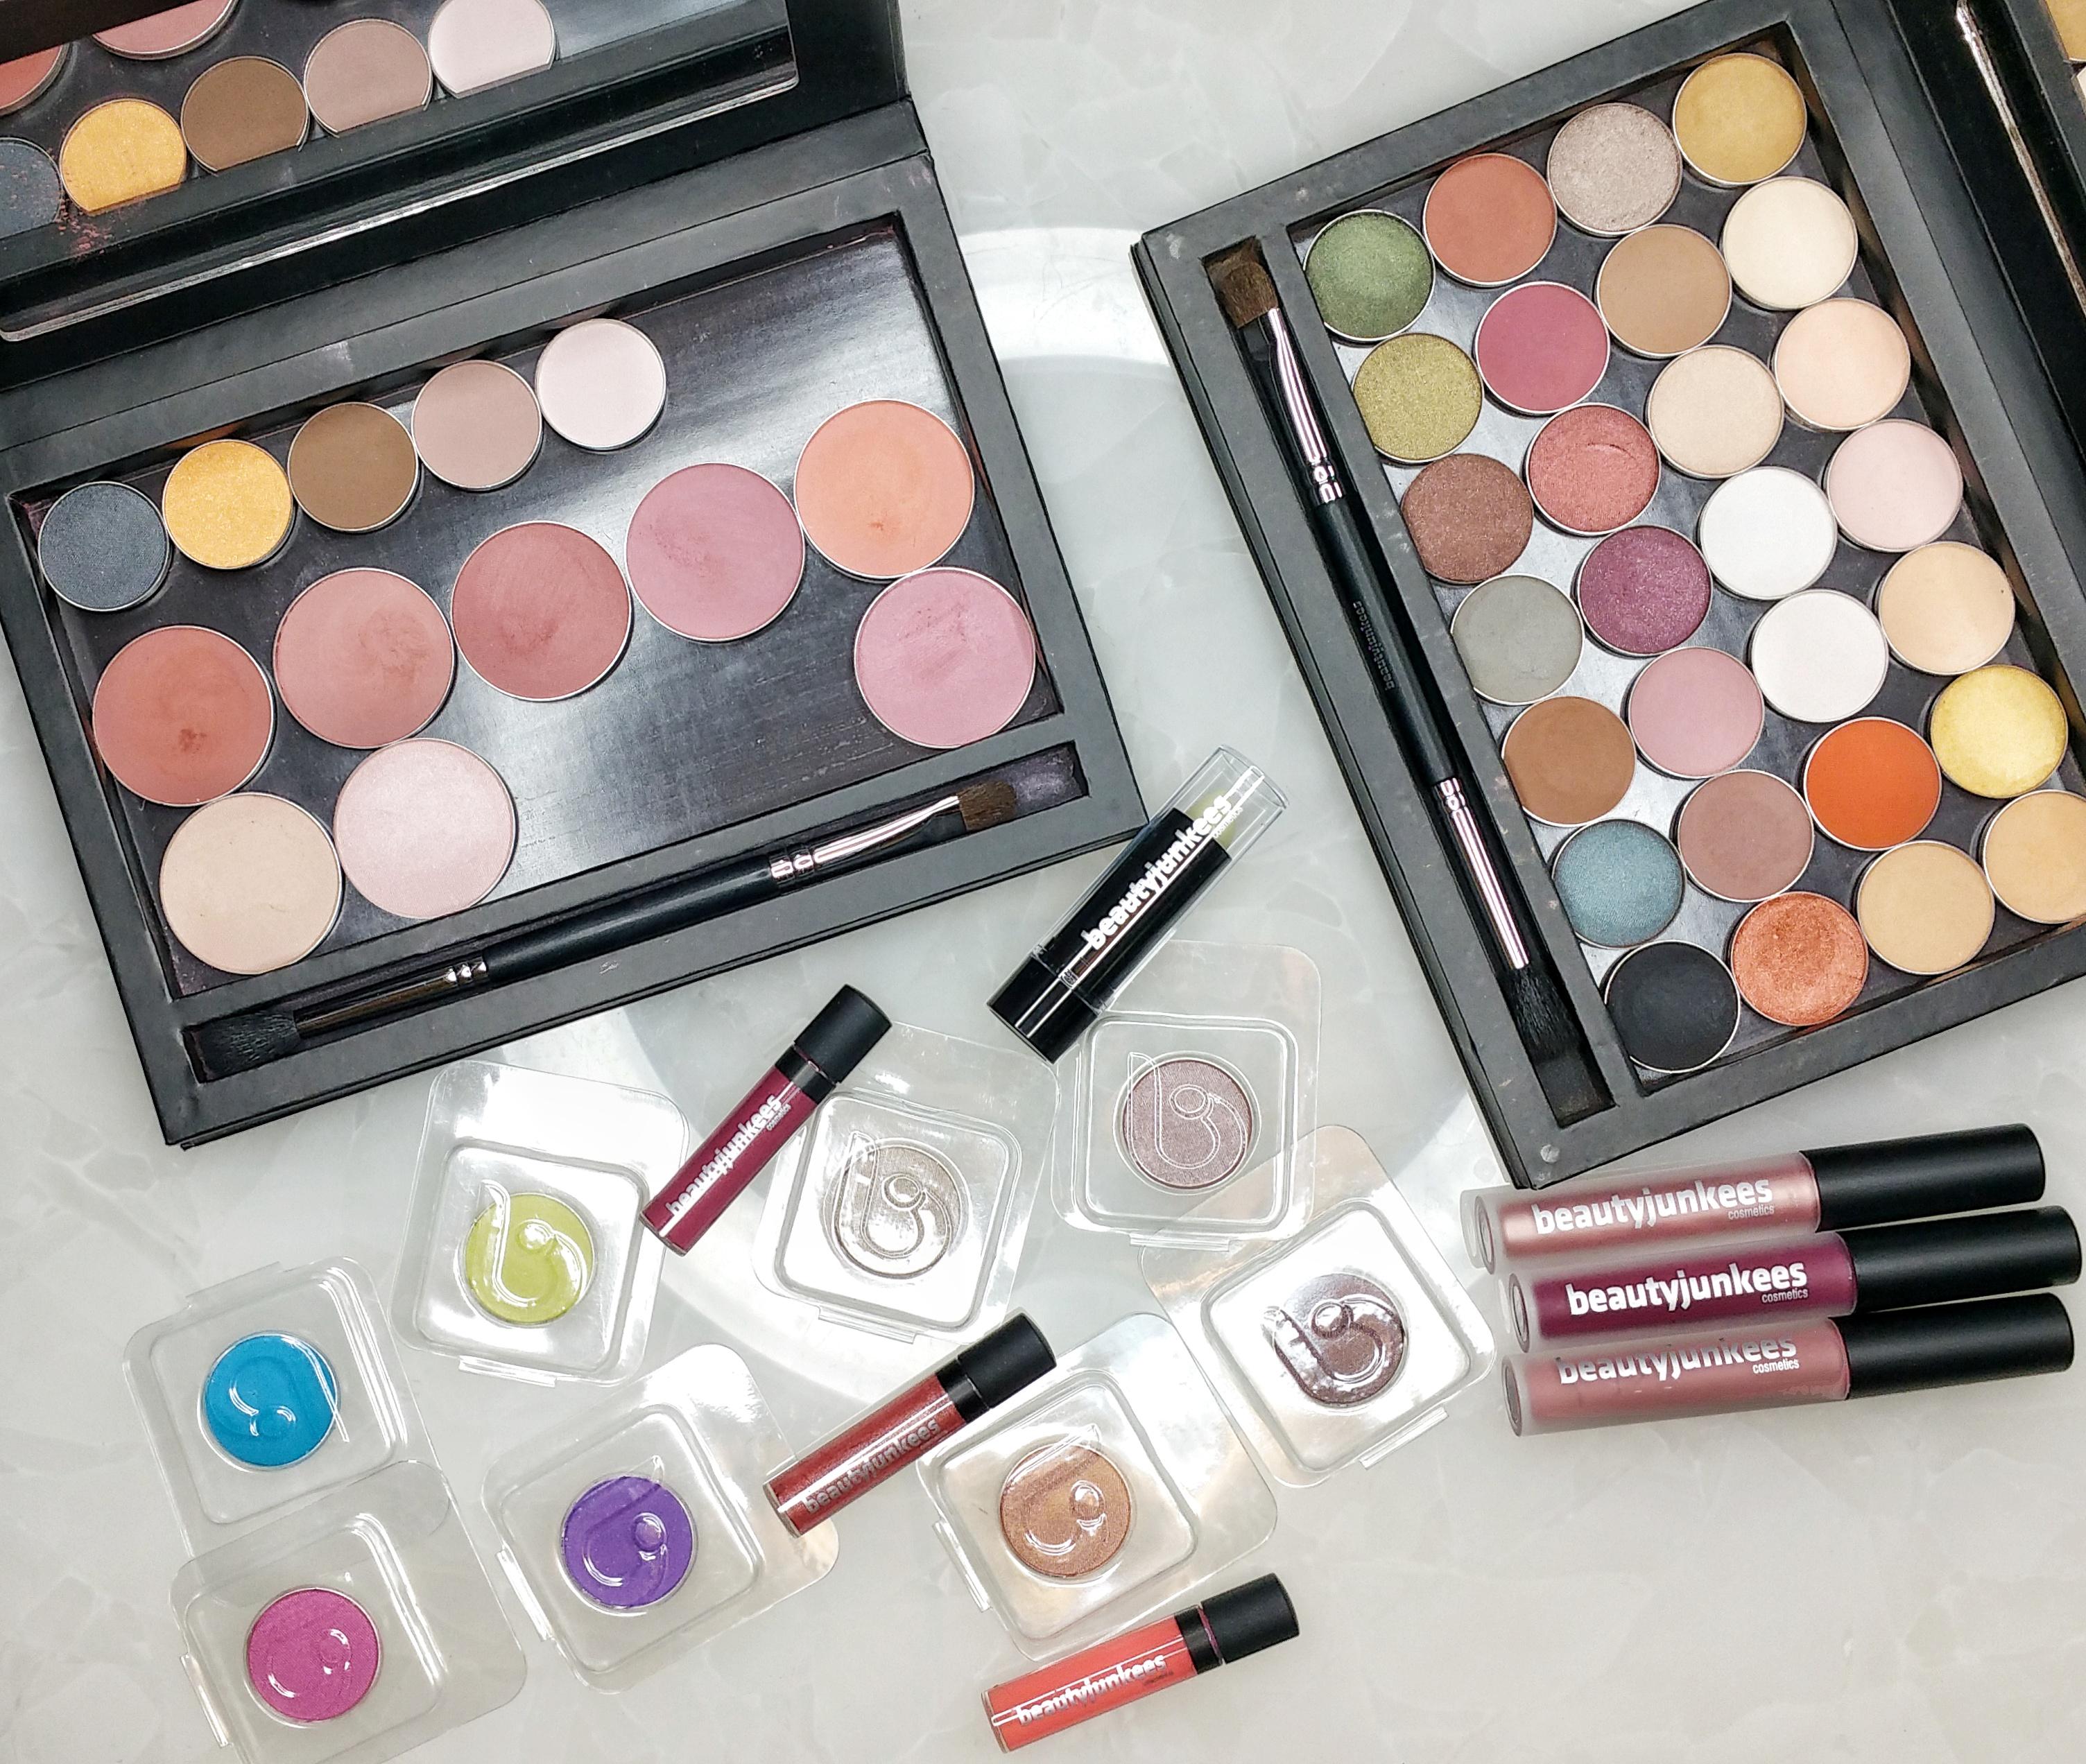 New Products From Beauty Junkees - Matte Liquid Lipsticks 6a1f5559b